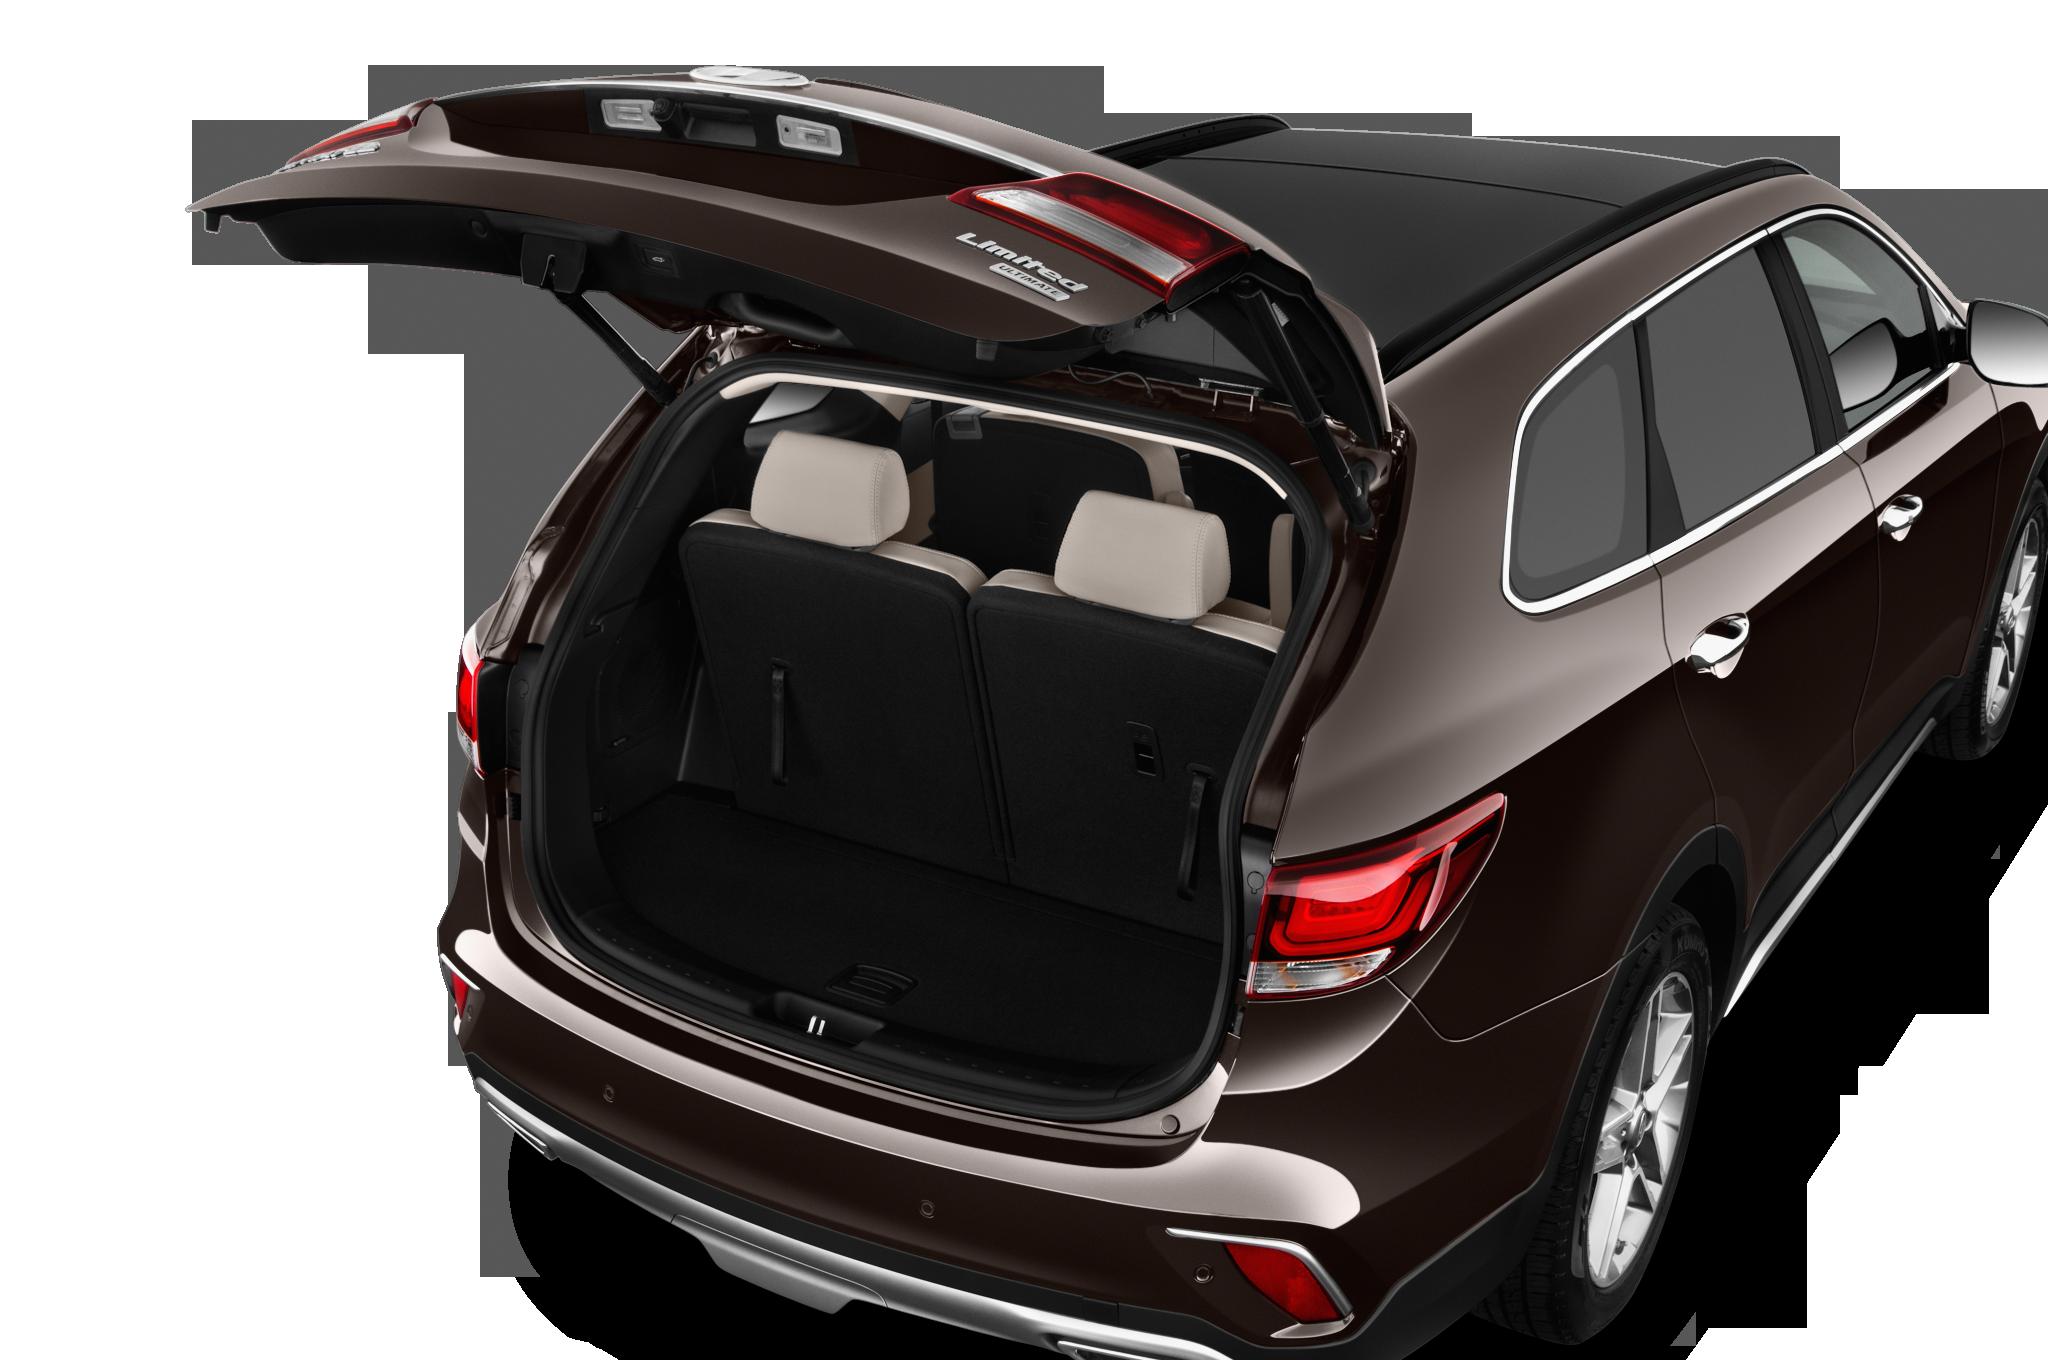 2017 Hyundai Santa Fe Sport IIHS testing